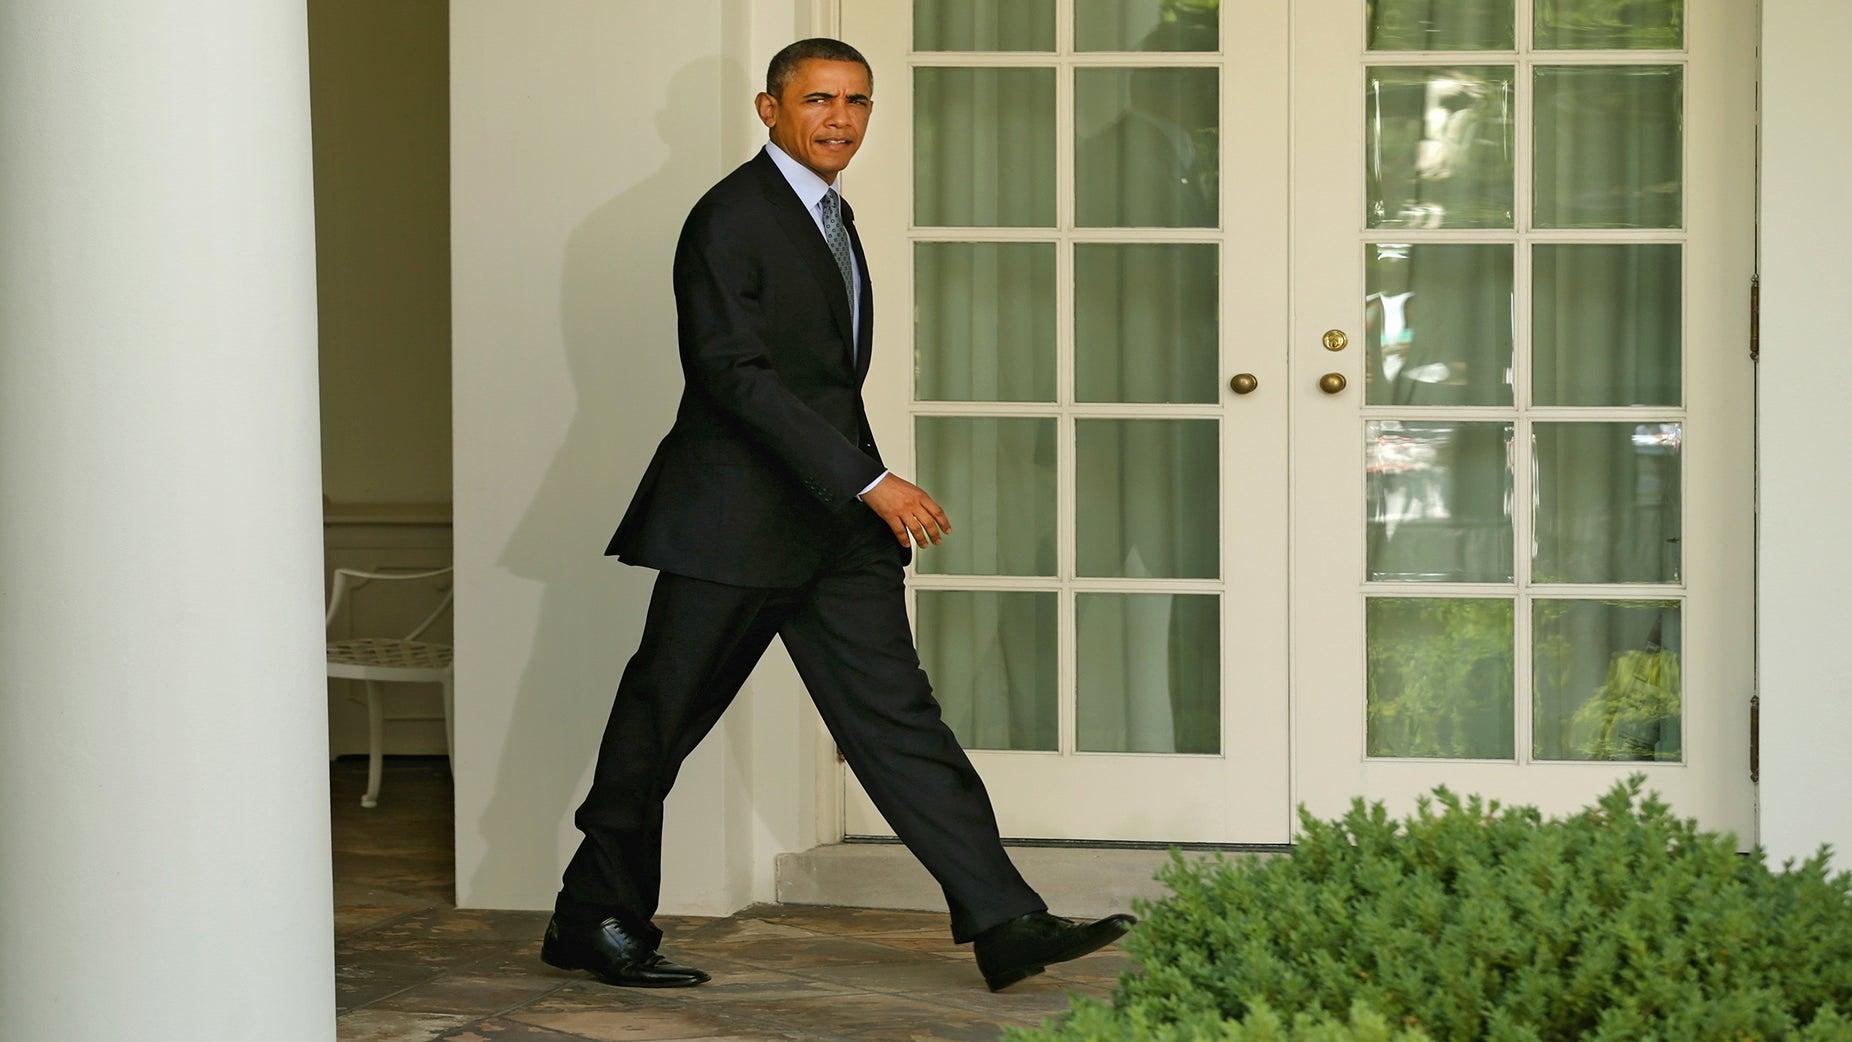 Obama Seeks Billions to Address Flood of Kids Crossing U.S. Border